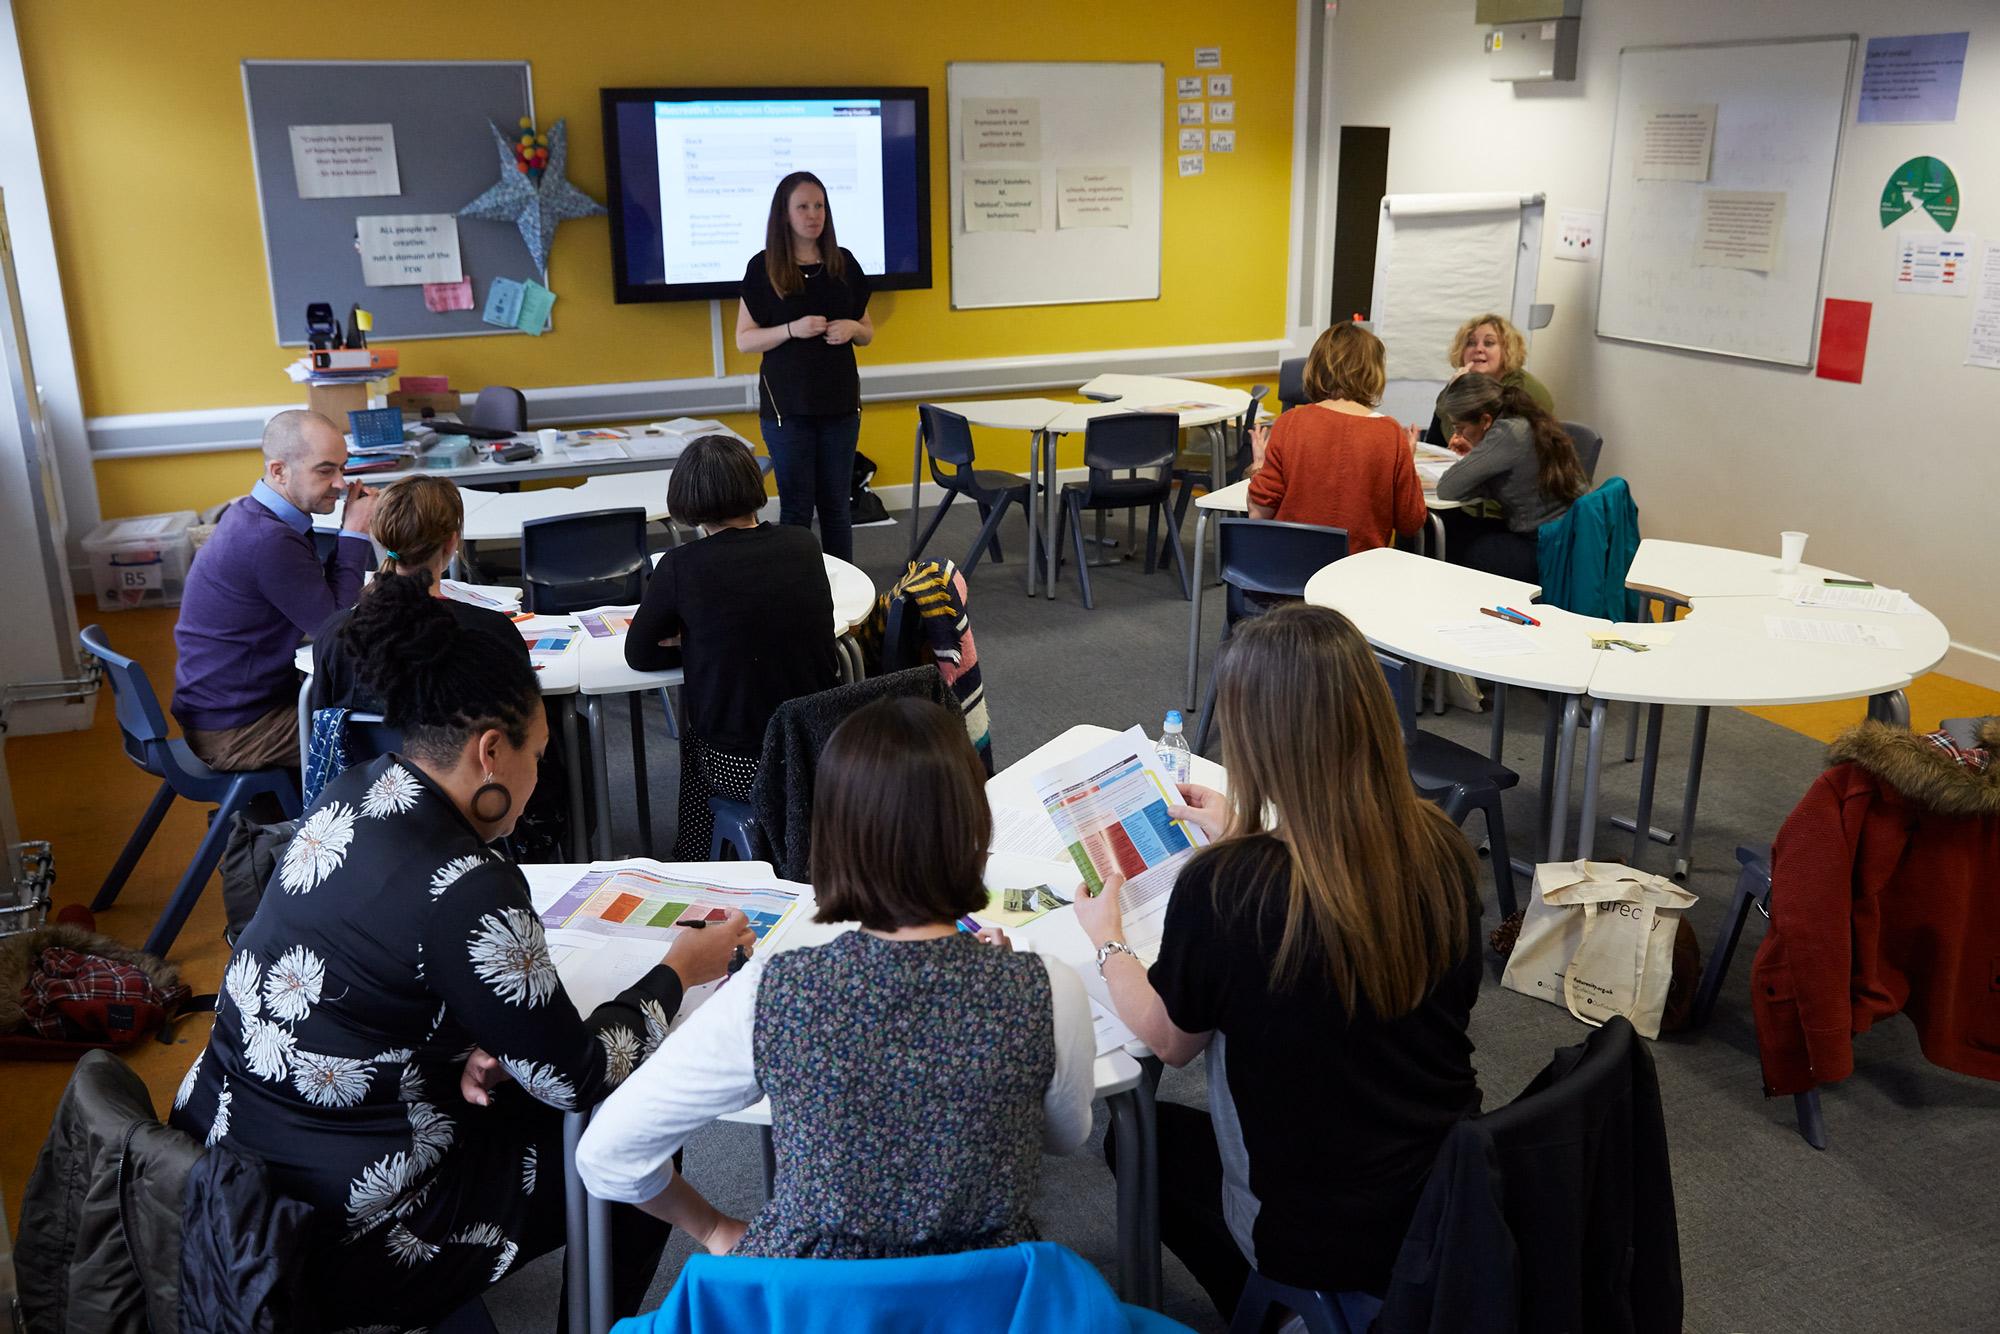 Laura Saunders - #BeCreative - Creativity framework explained